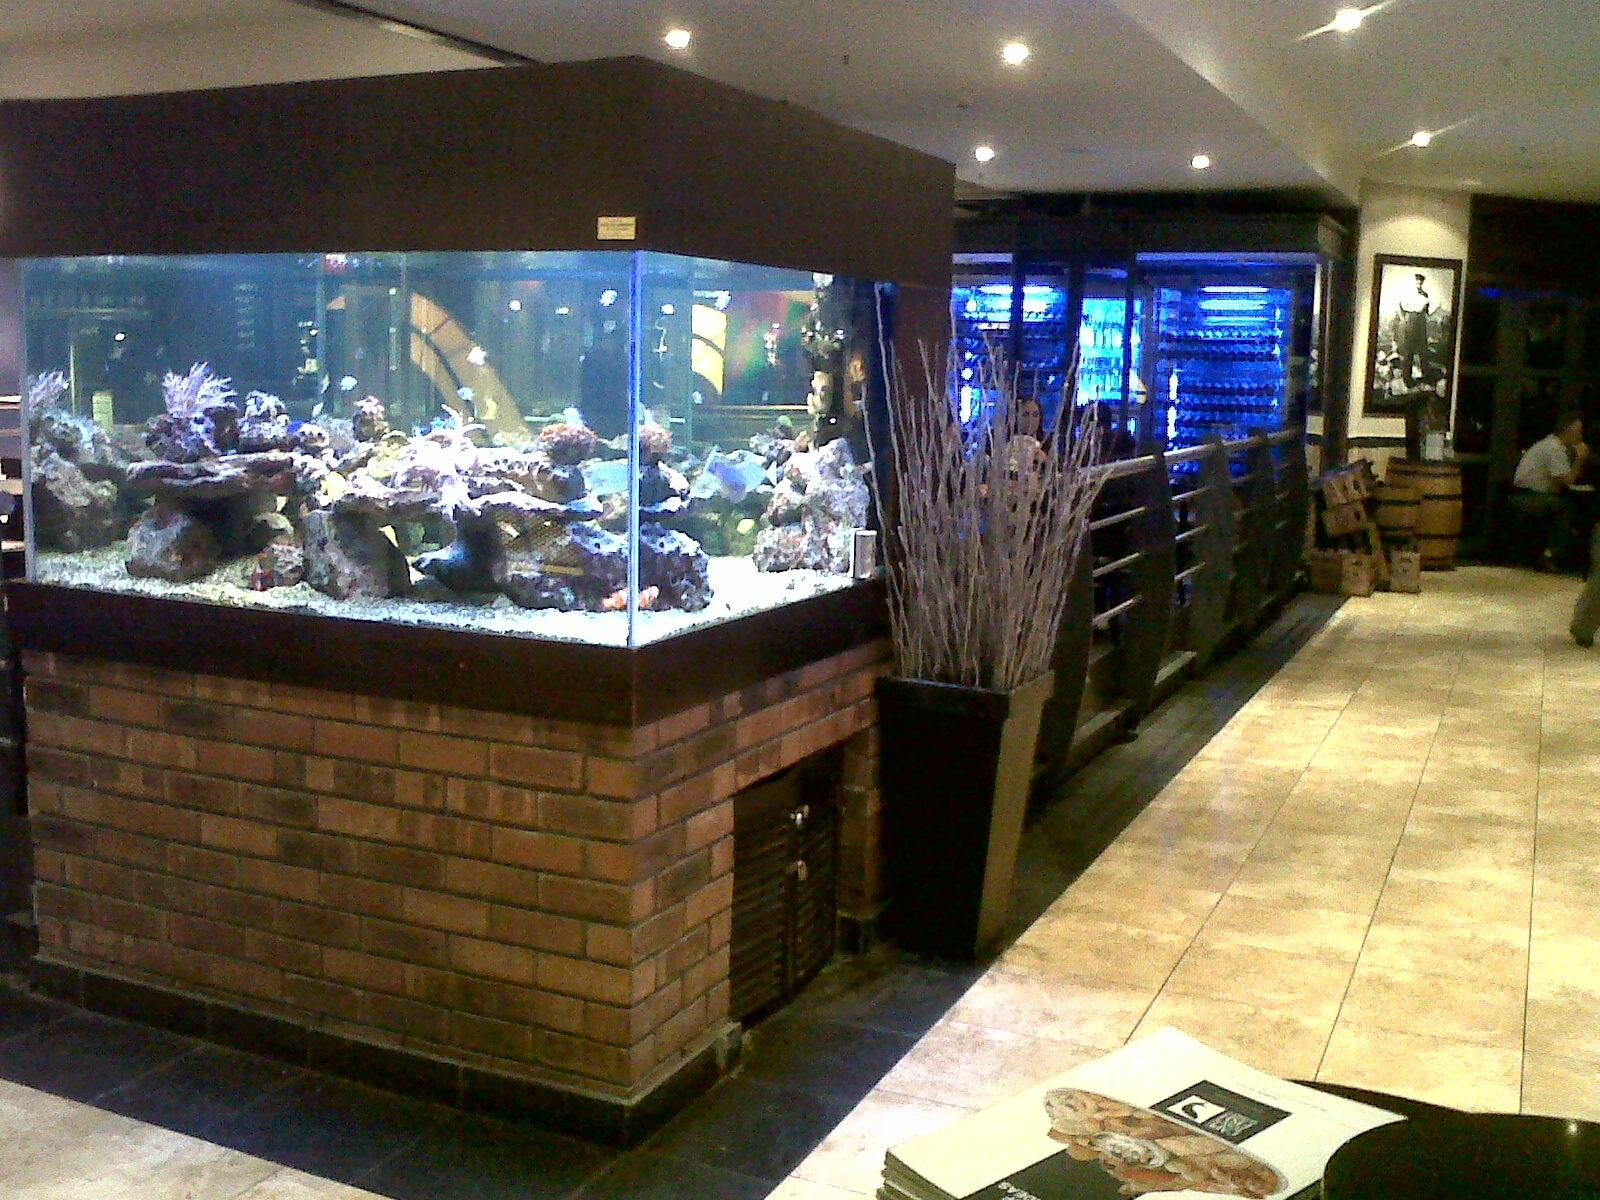 Freshwater aquarium fish cape town - Freshwater Aquarium Fish Cape Town